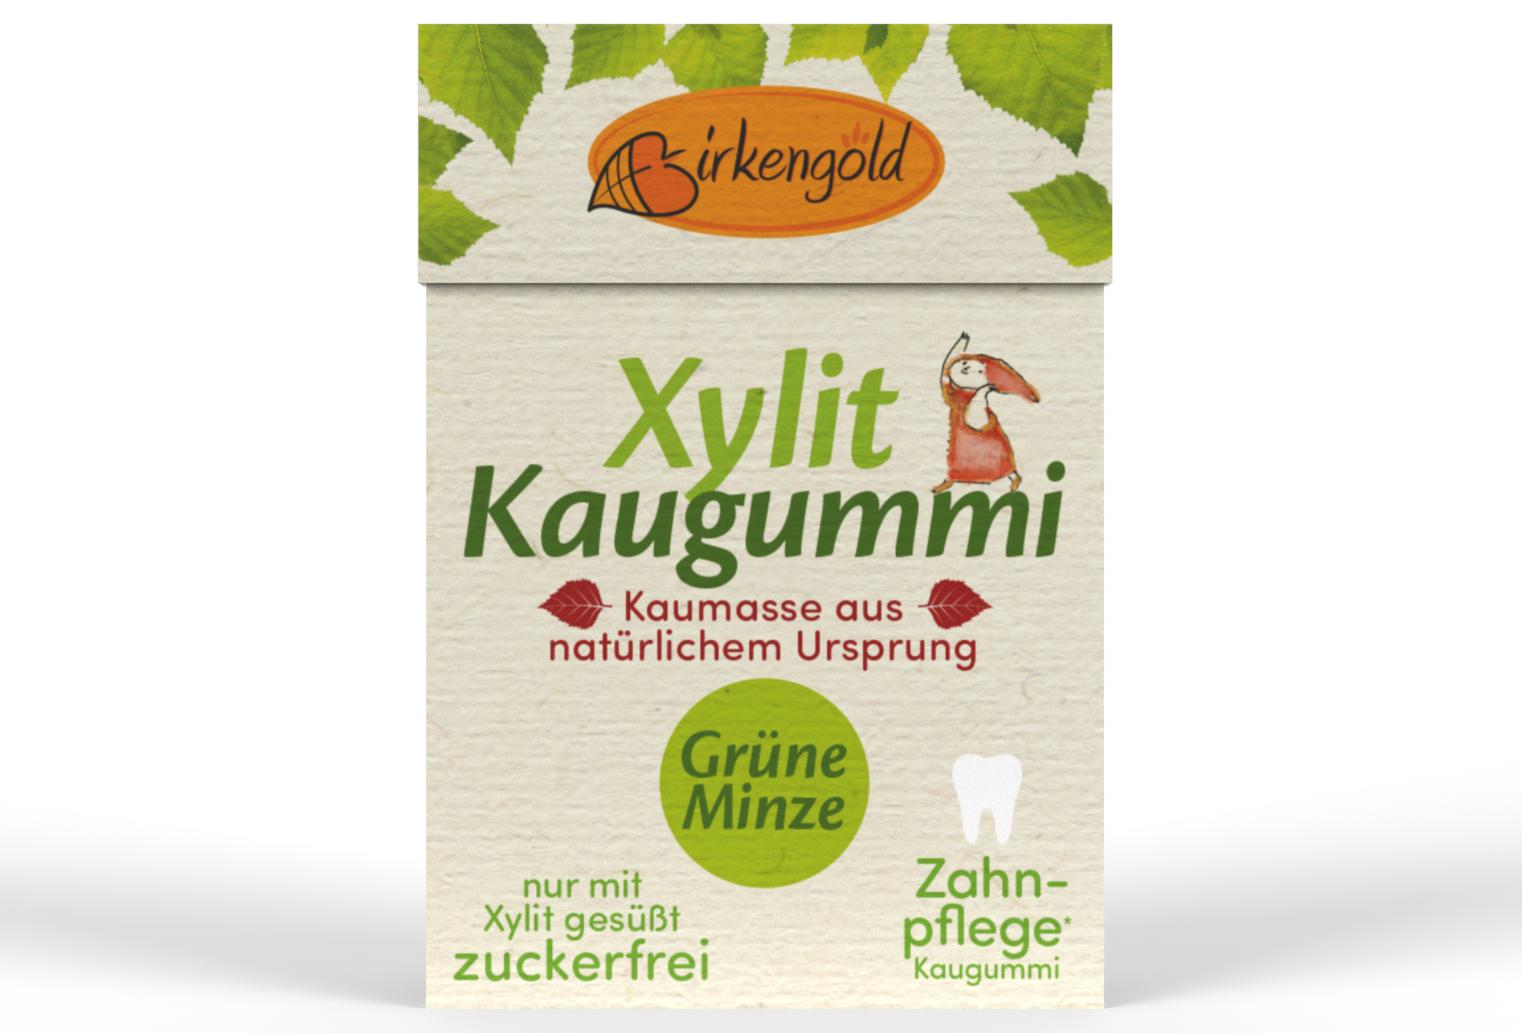 Birkengold Kaugummi Grüne Minze nat. Kaumasse